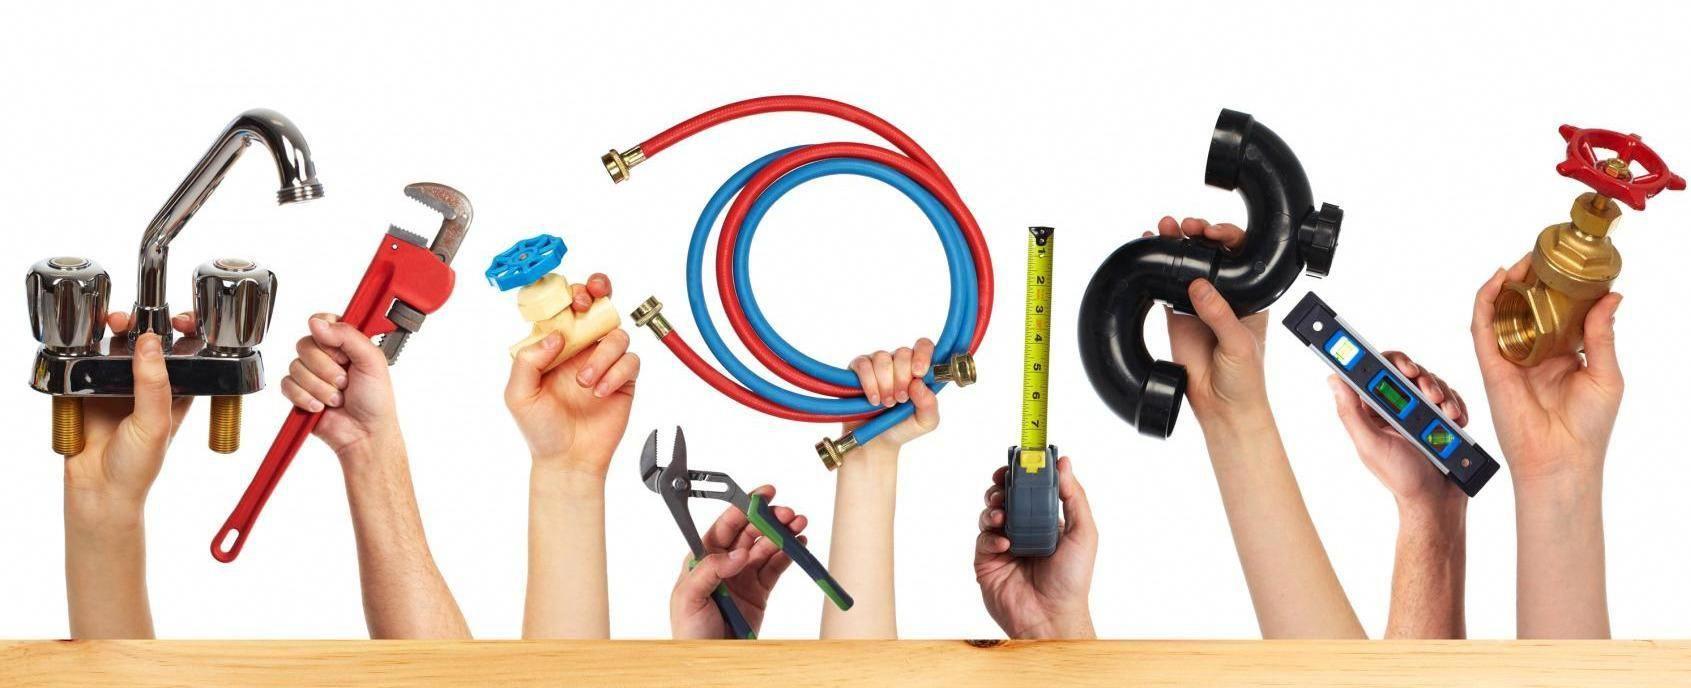 plumbing hacks, plumbing valves, plumbing 401, plumbing